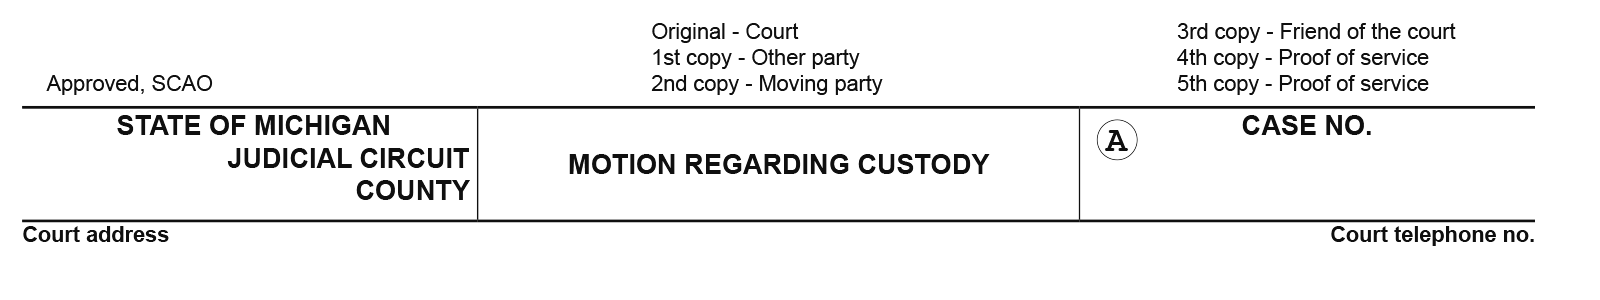 Legal form used to establish child custody in Michigan